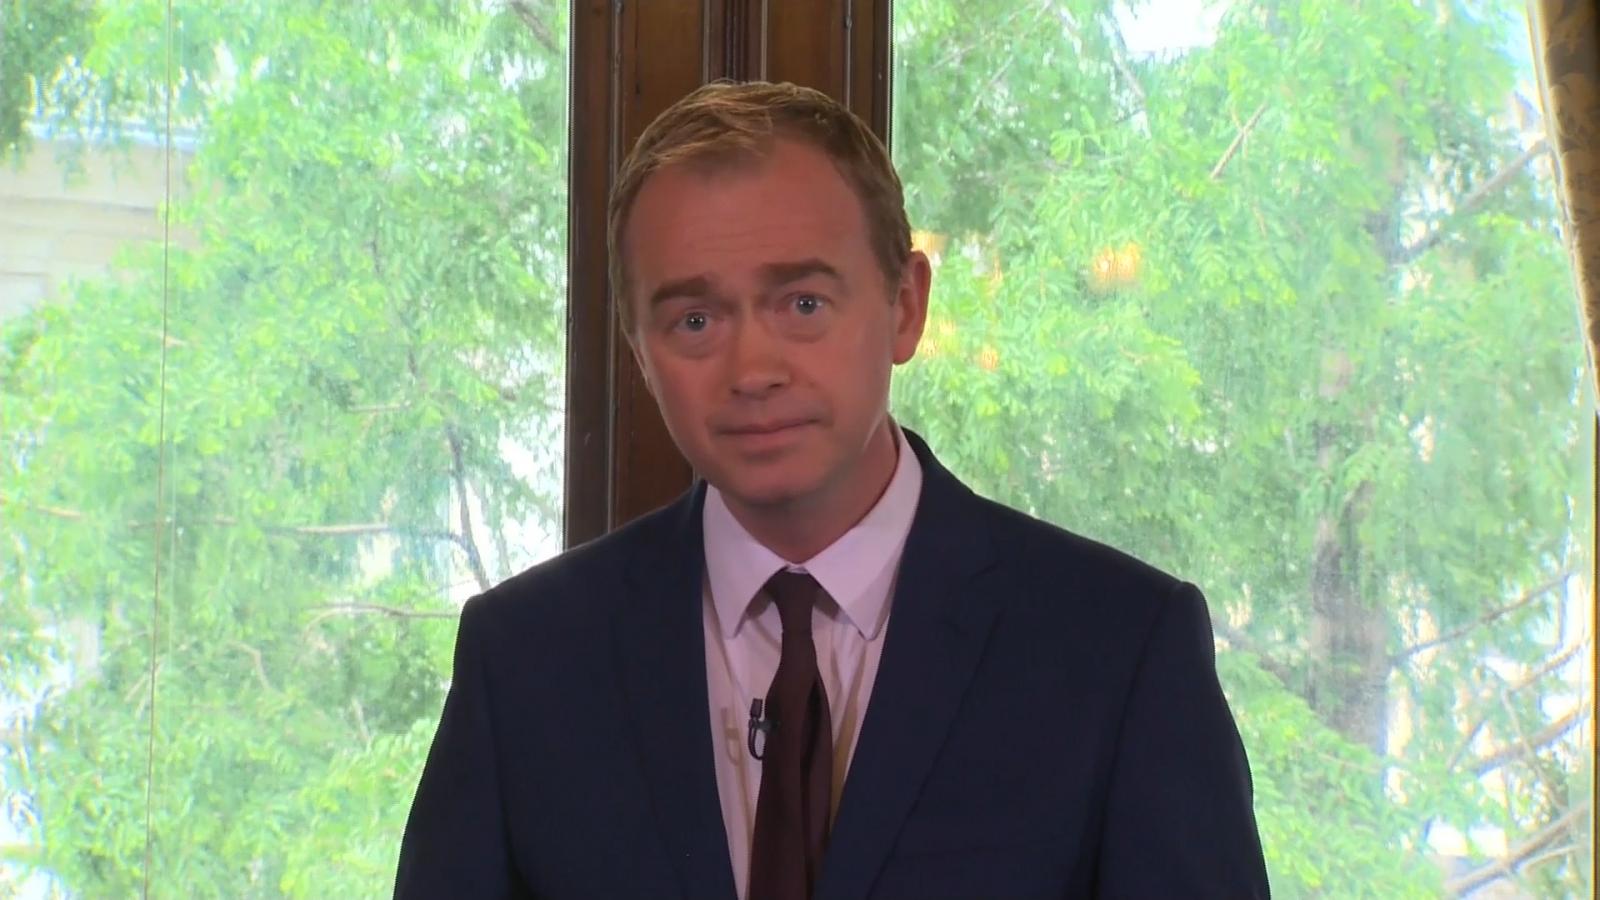 tim-farron-calls-on-theresa-may-to-resign